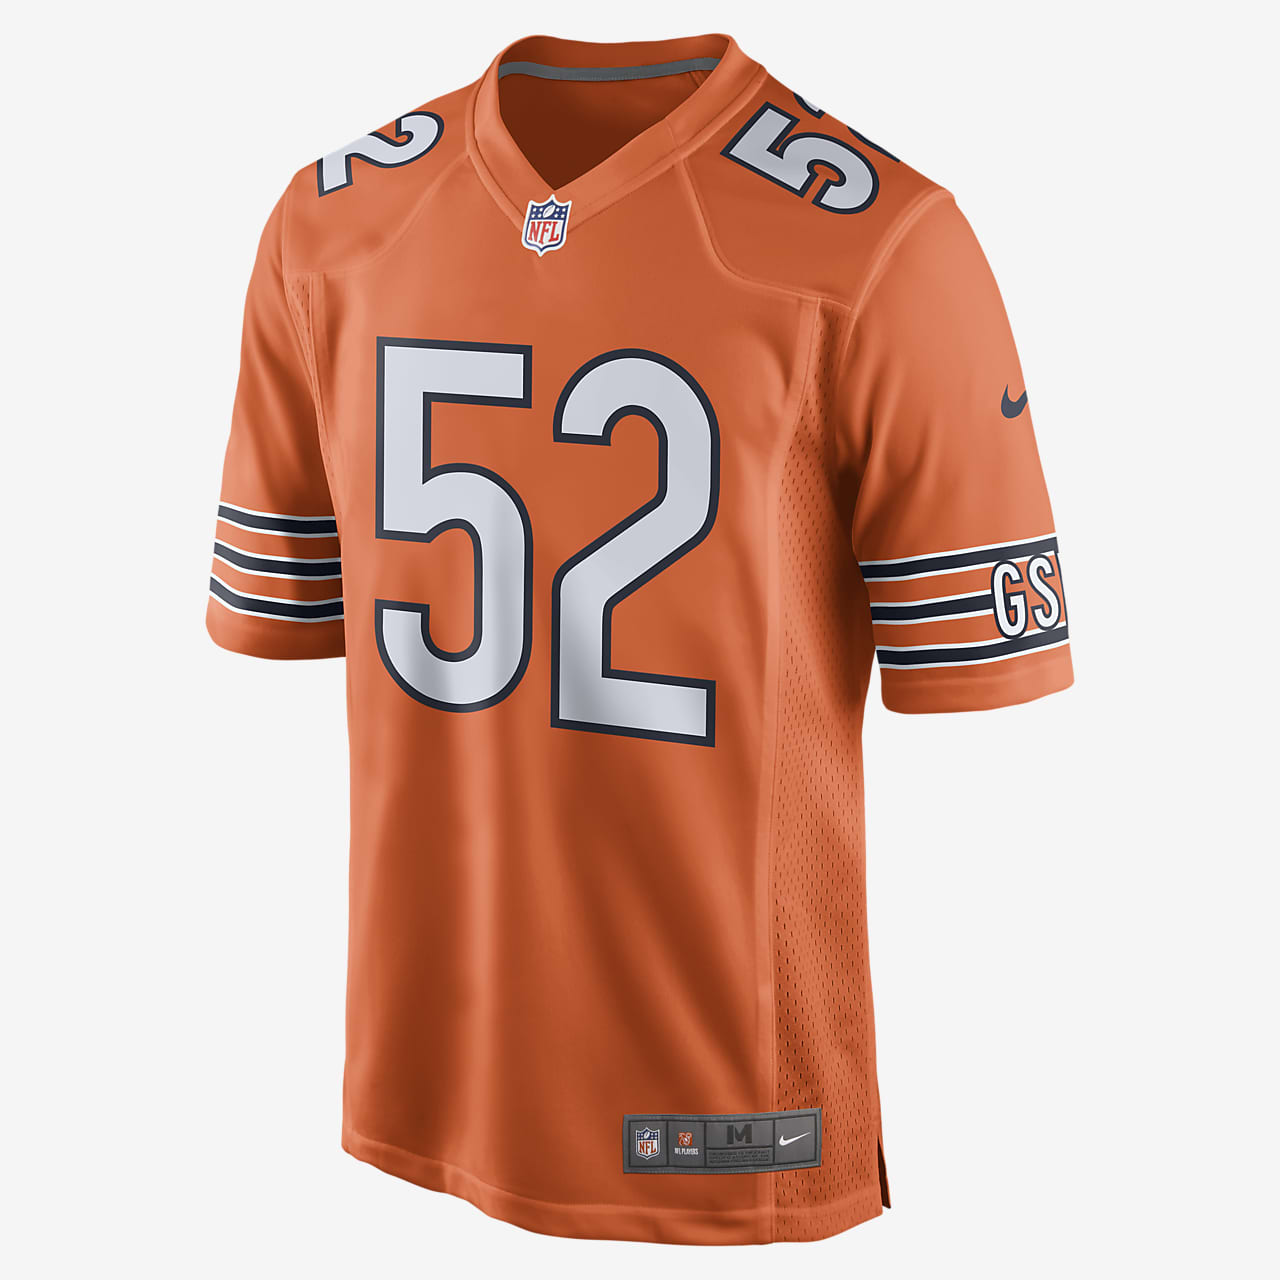 NFL Chicago Bears Game Jersey (Khalil Mack) Men's Football Jersey